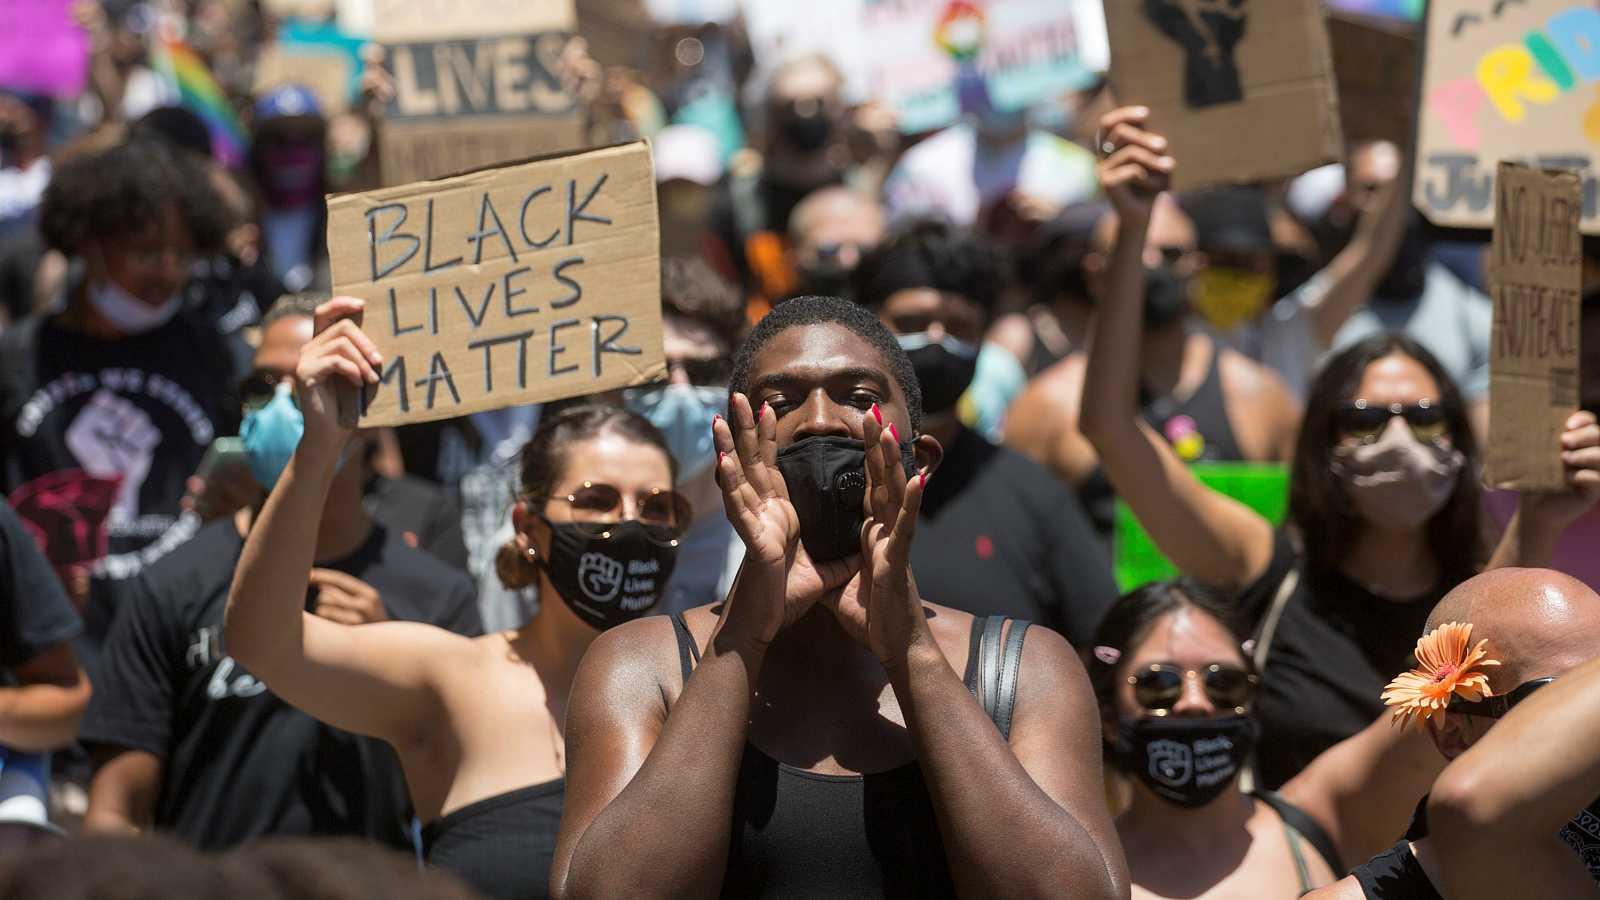 Participantes en la marcha 'All Black Lives Matter' organizada por Black LGBTQ+ en Hollywood, Los Angeles.